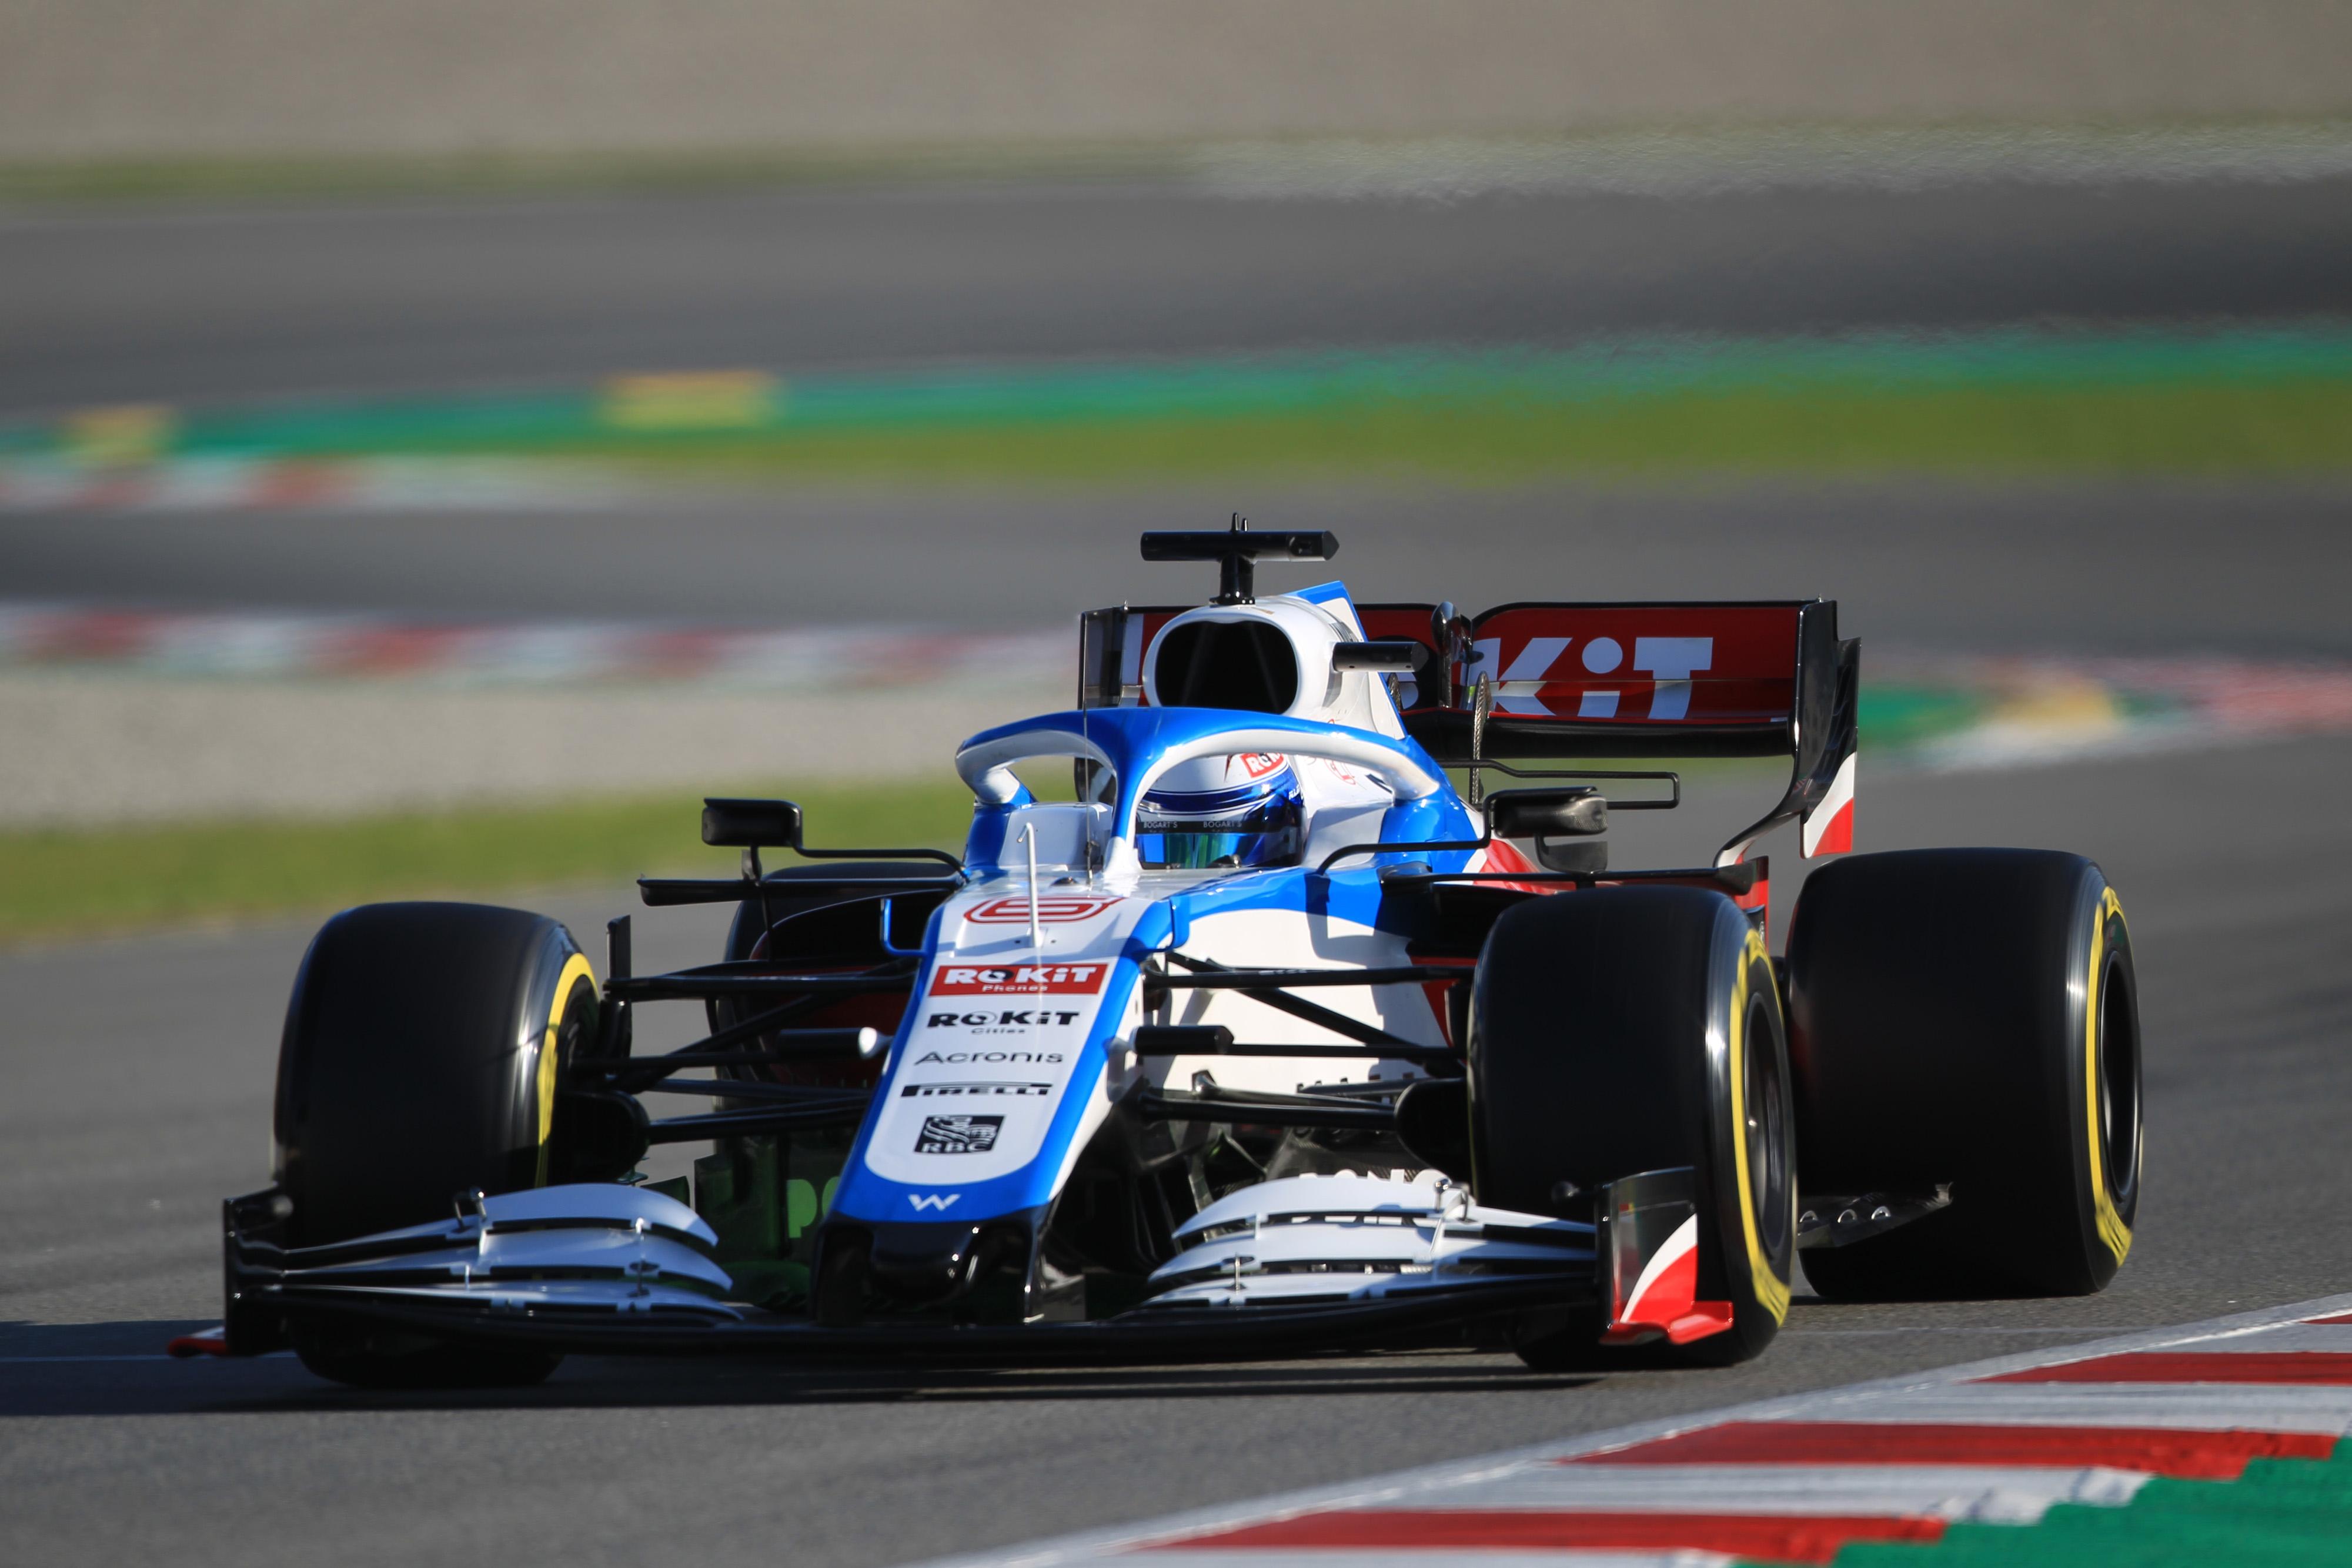 F1 Formula 1 Nicholas Latifi Williams car